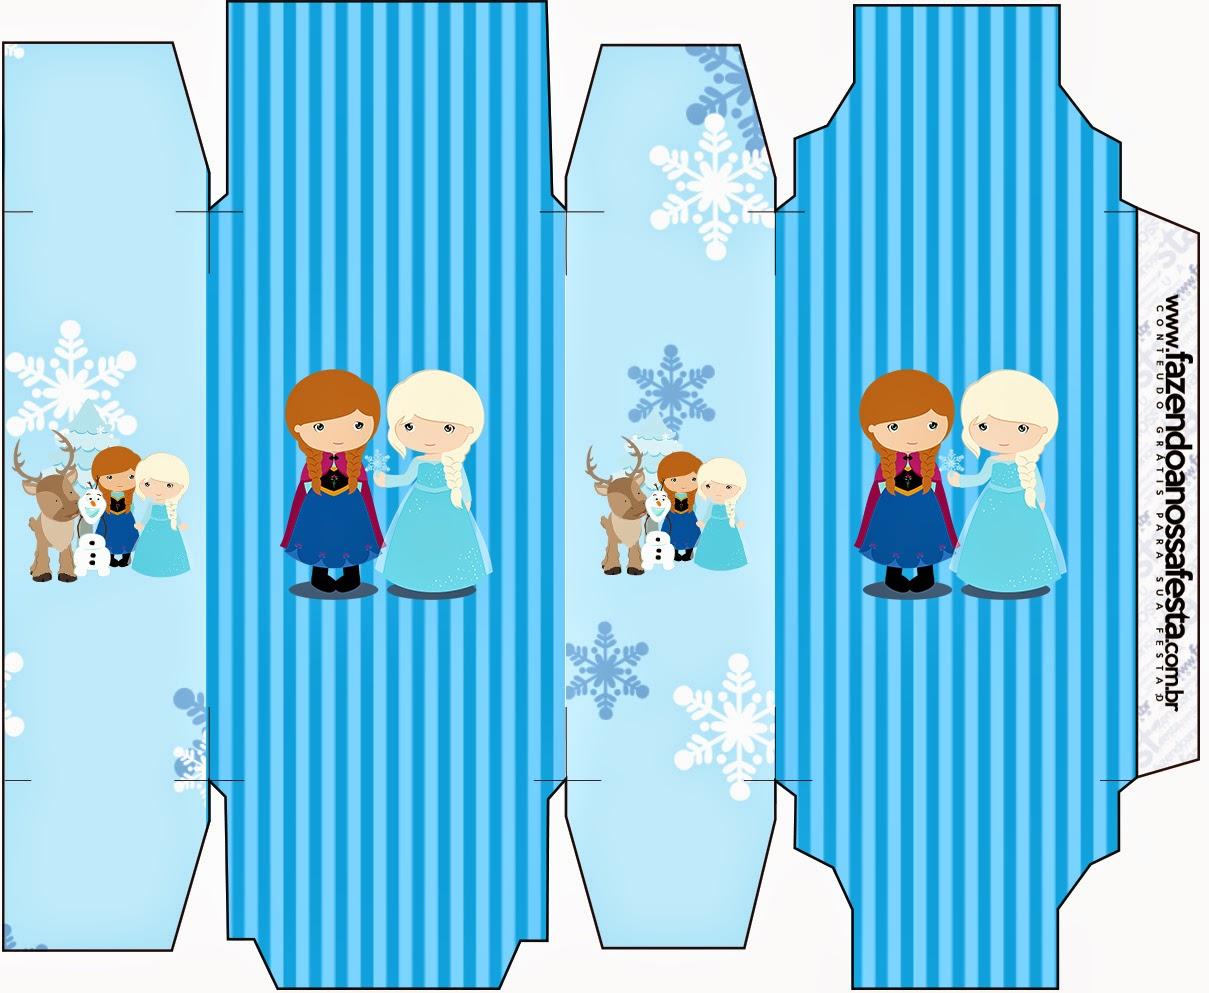 Caja para Imprimir Gratis de Frozen Niñas para Navidad Azul.